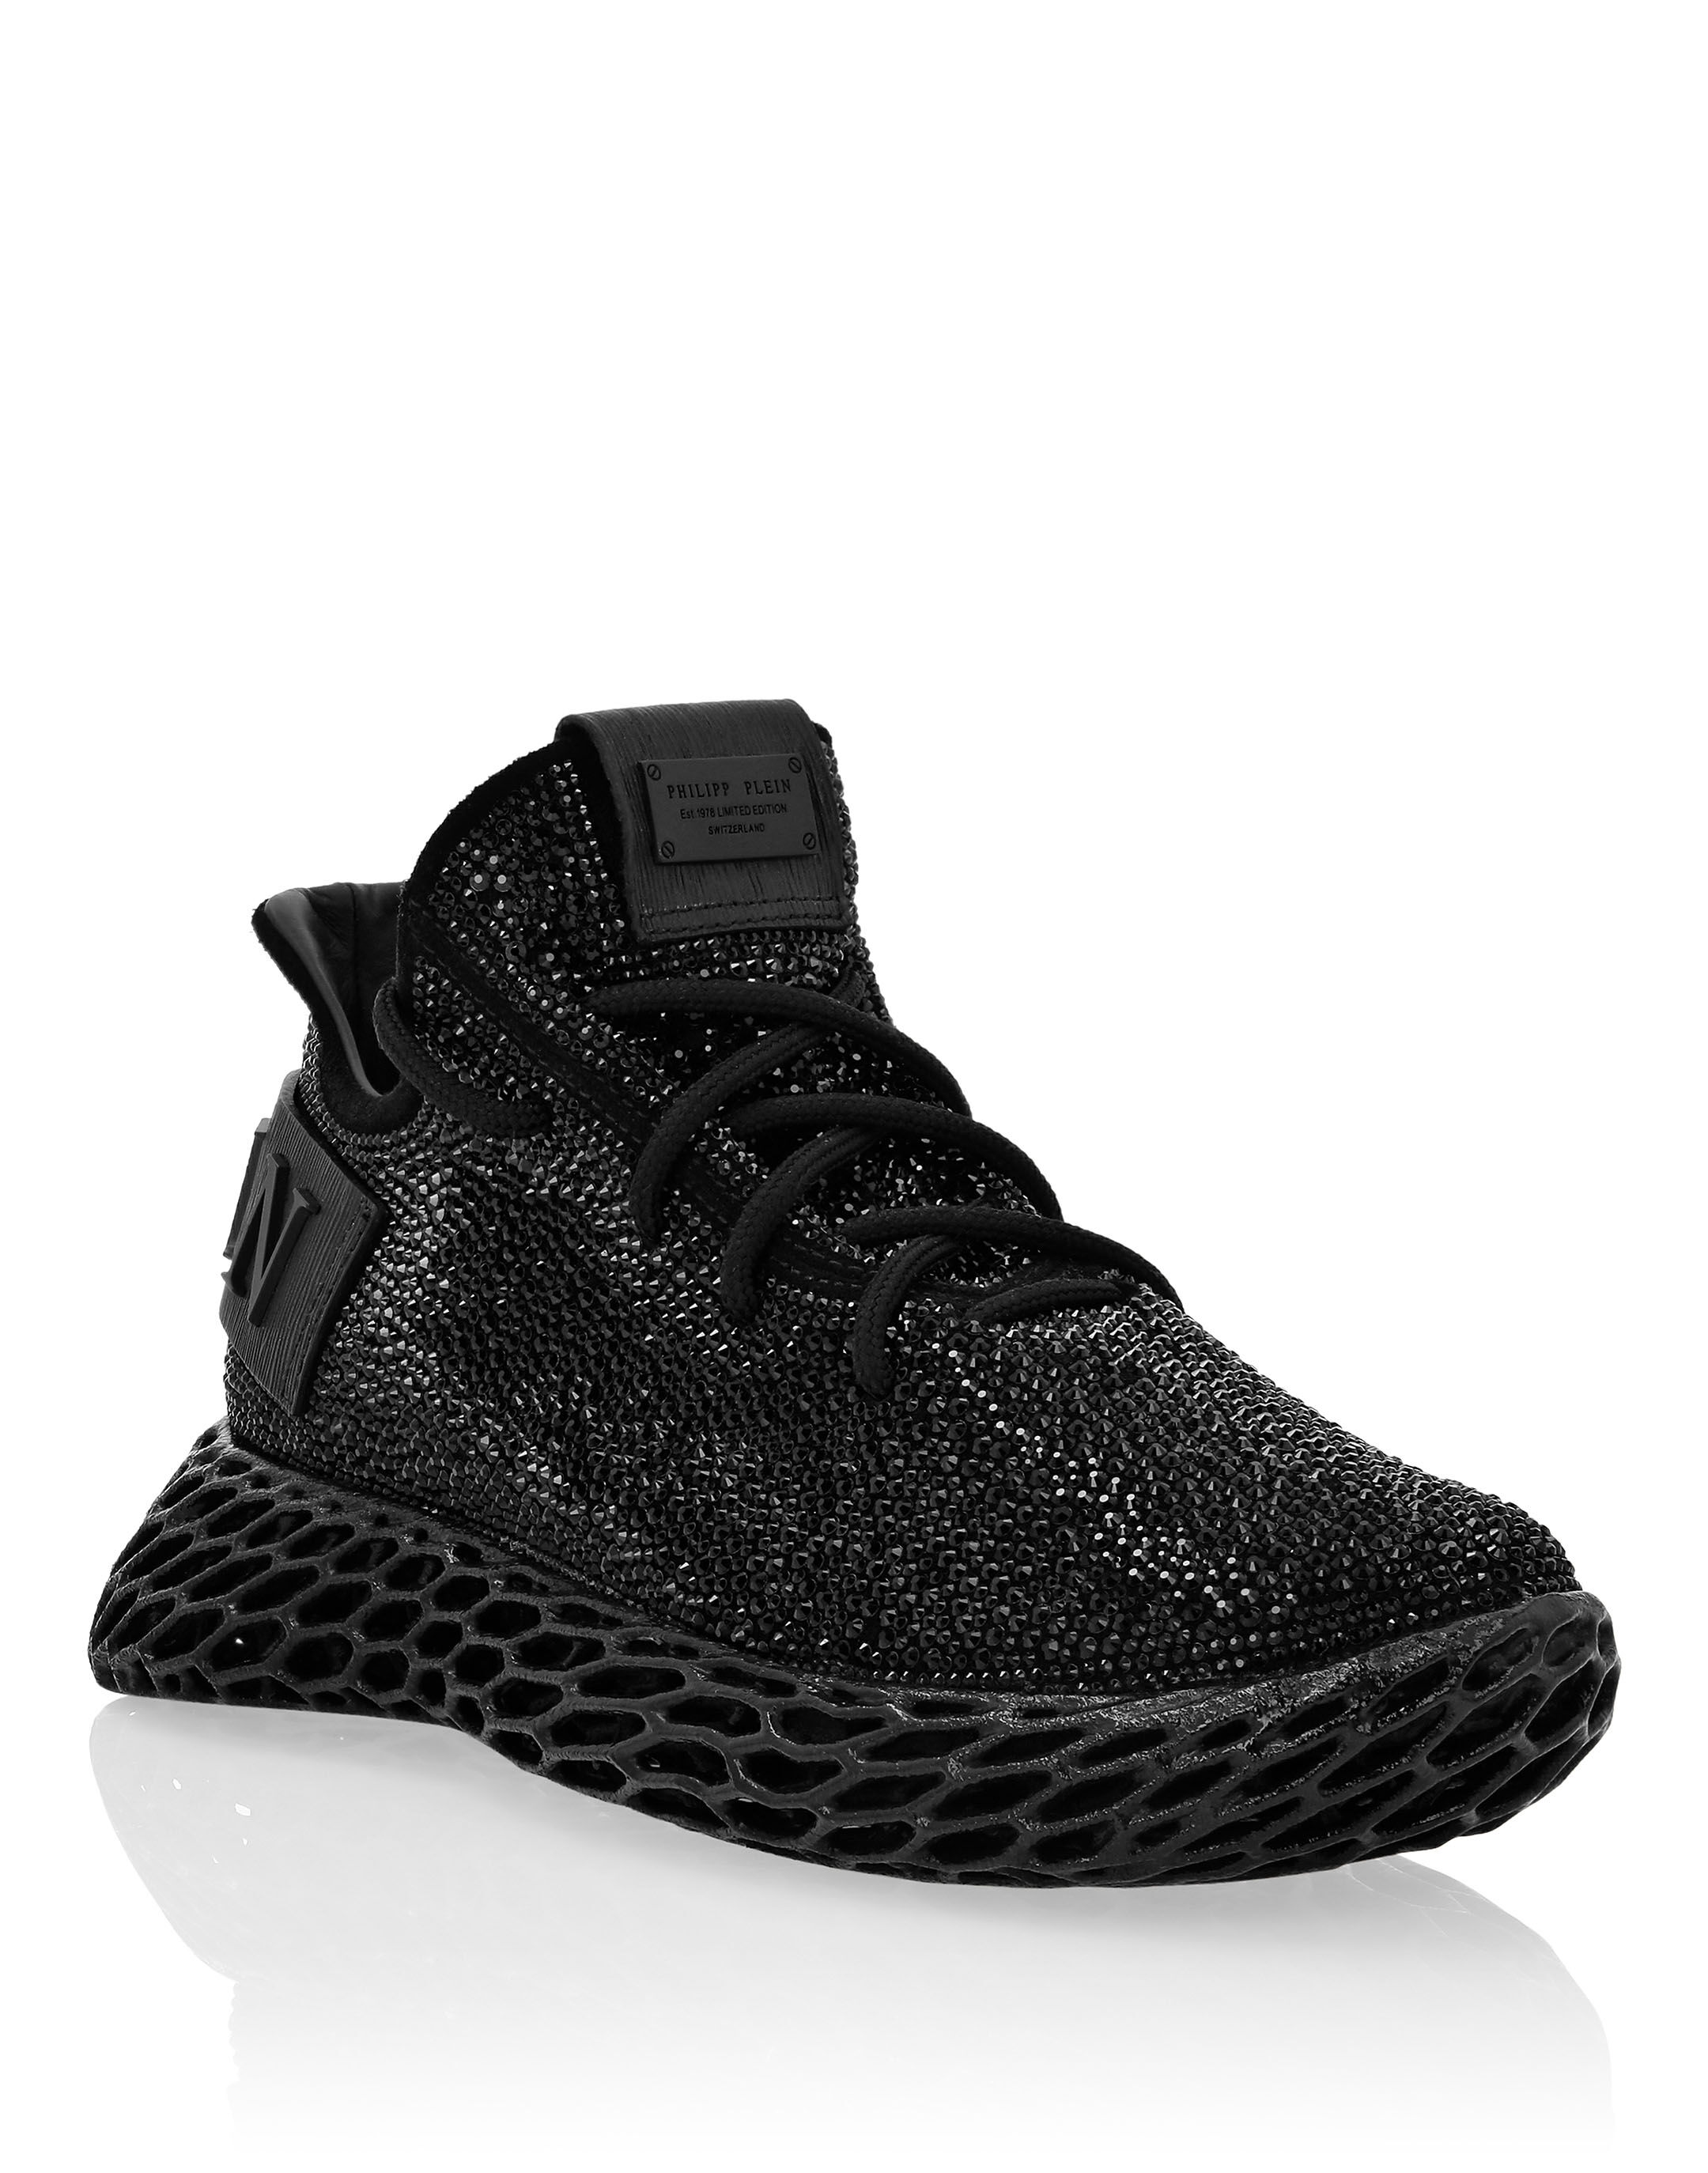 Men's Shoes   Philipp Plein